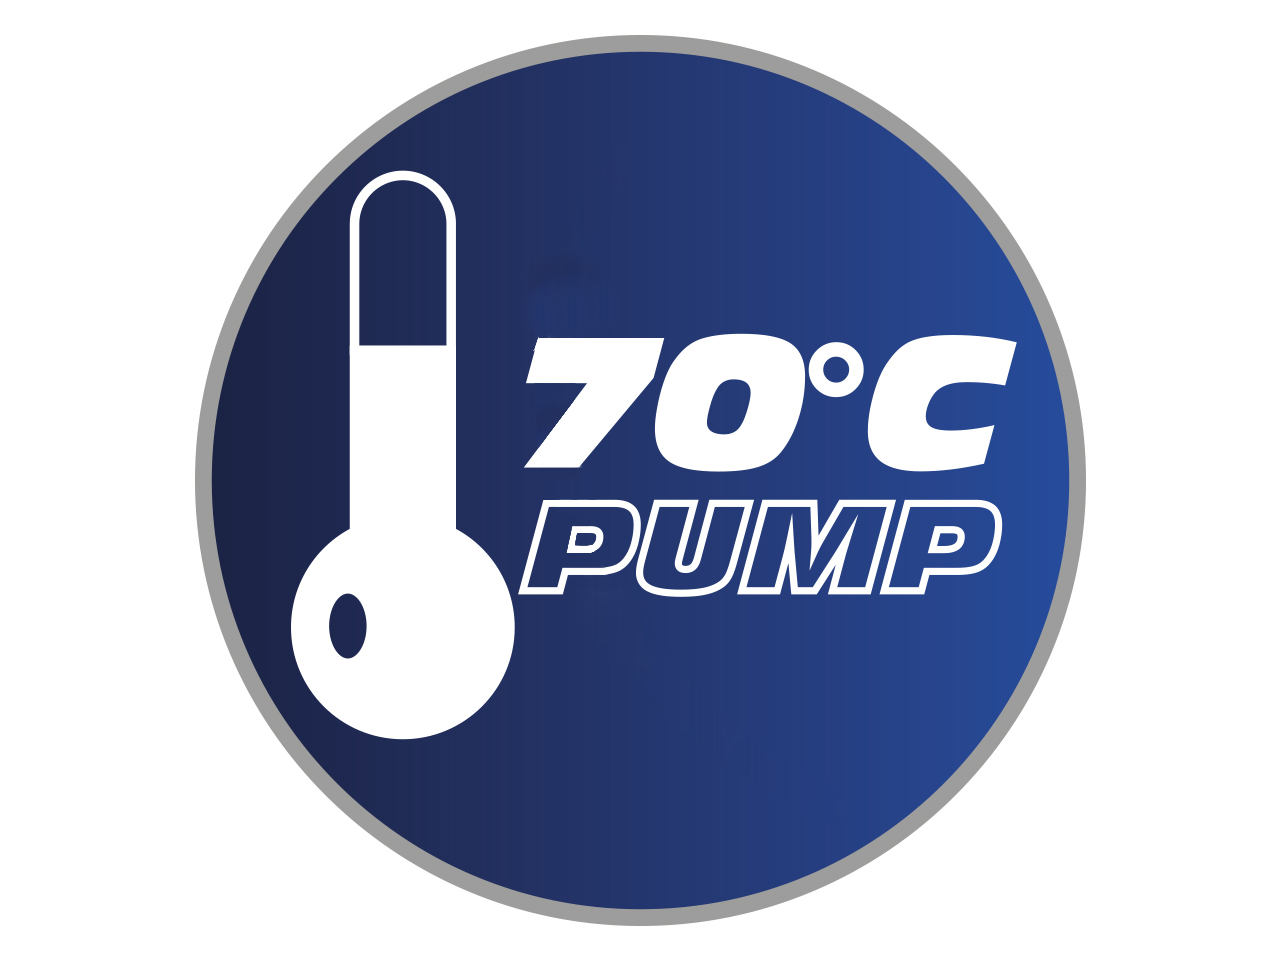 IDROPULITRICI PROFESSIONALI AD ACQUA FREDDA PROFESSIONAL COLD WATER HIGH PRESSURE CLEANERS 9.jpg